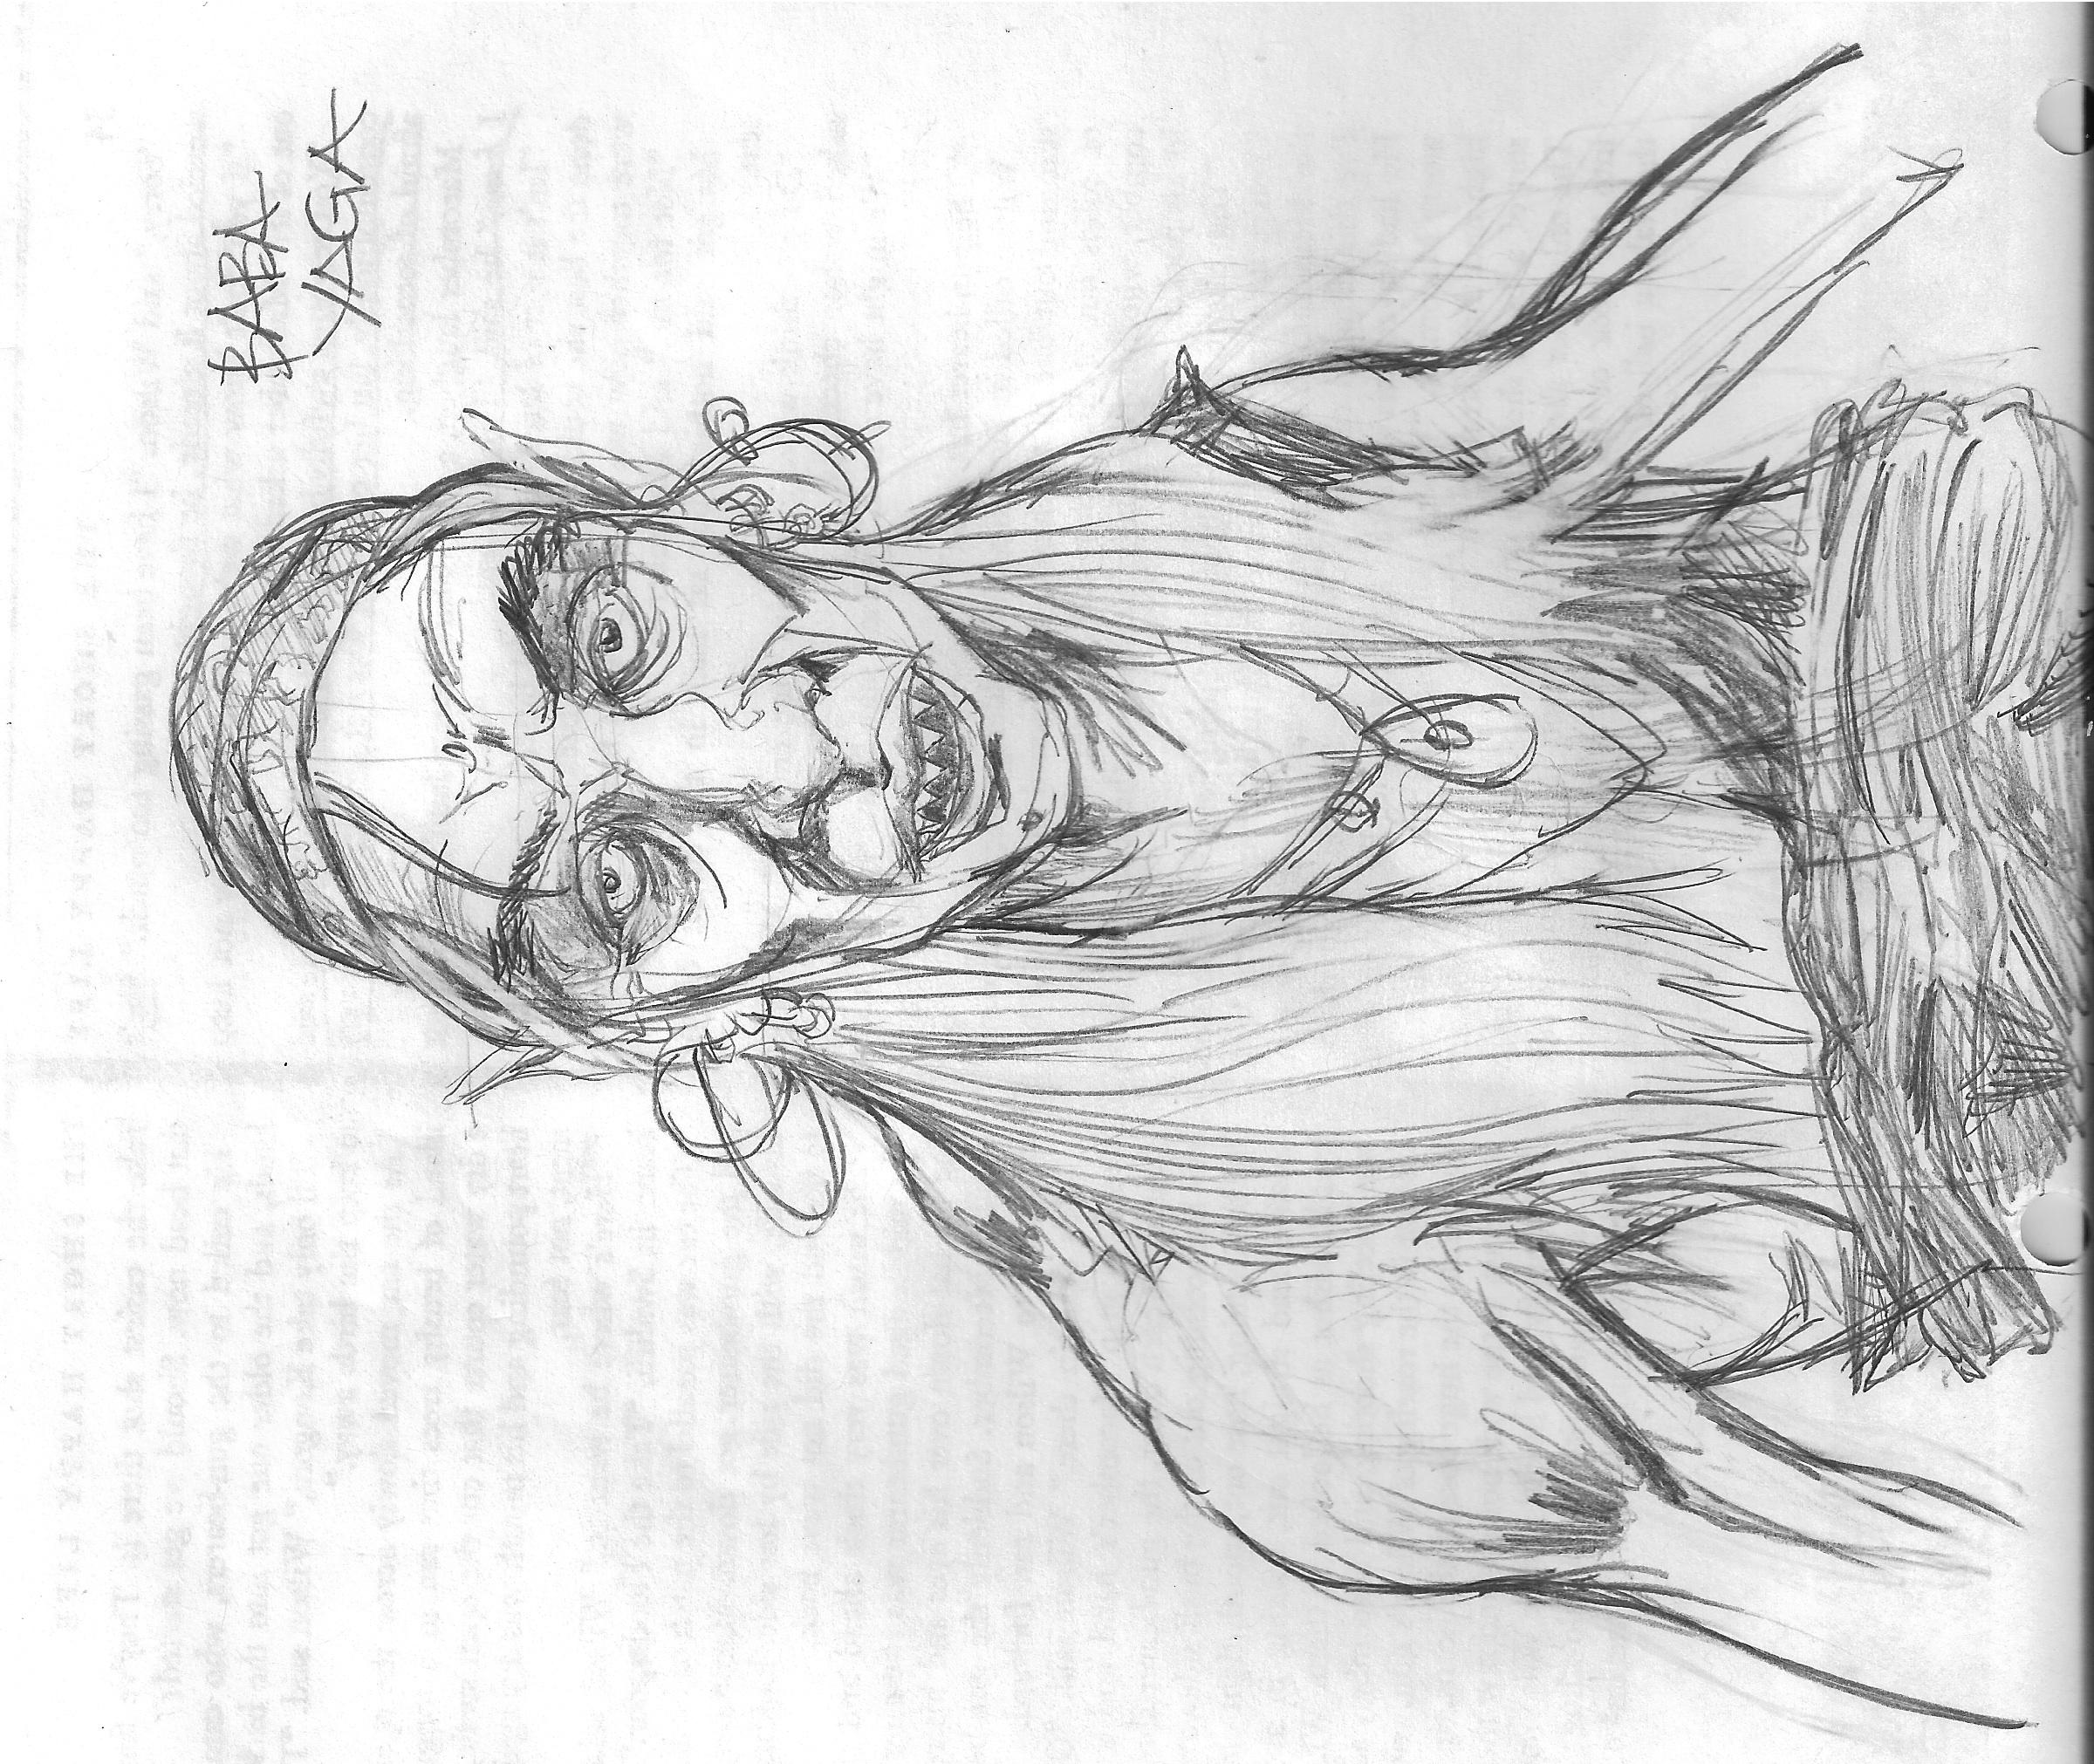 Baba Yaga Sketch 1